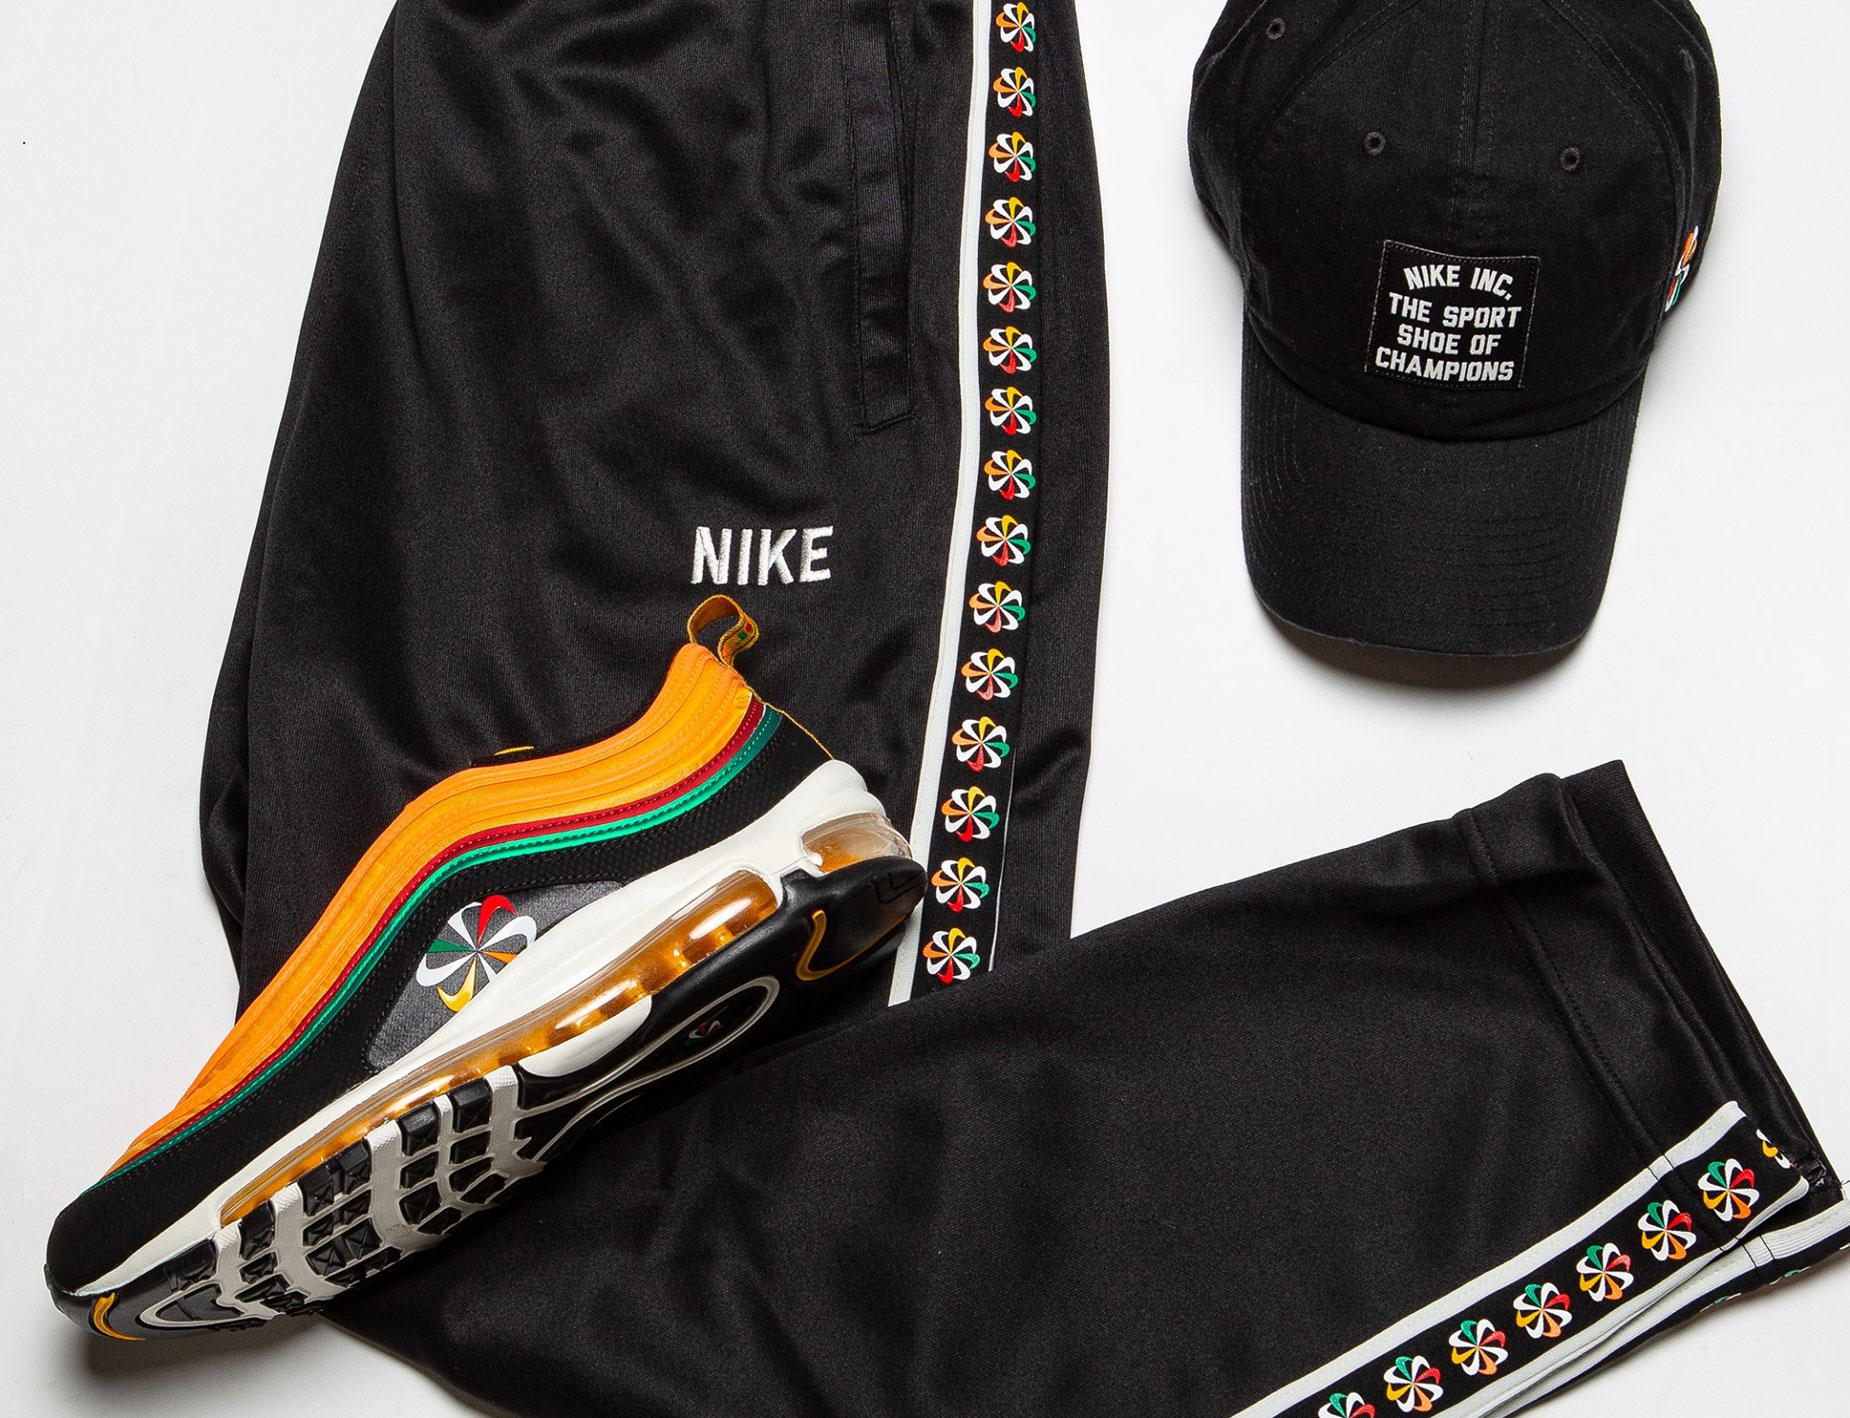 nike-air-max-97-sunburst-hat-clothing-match